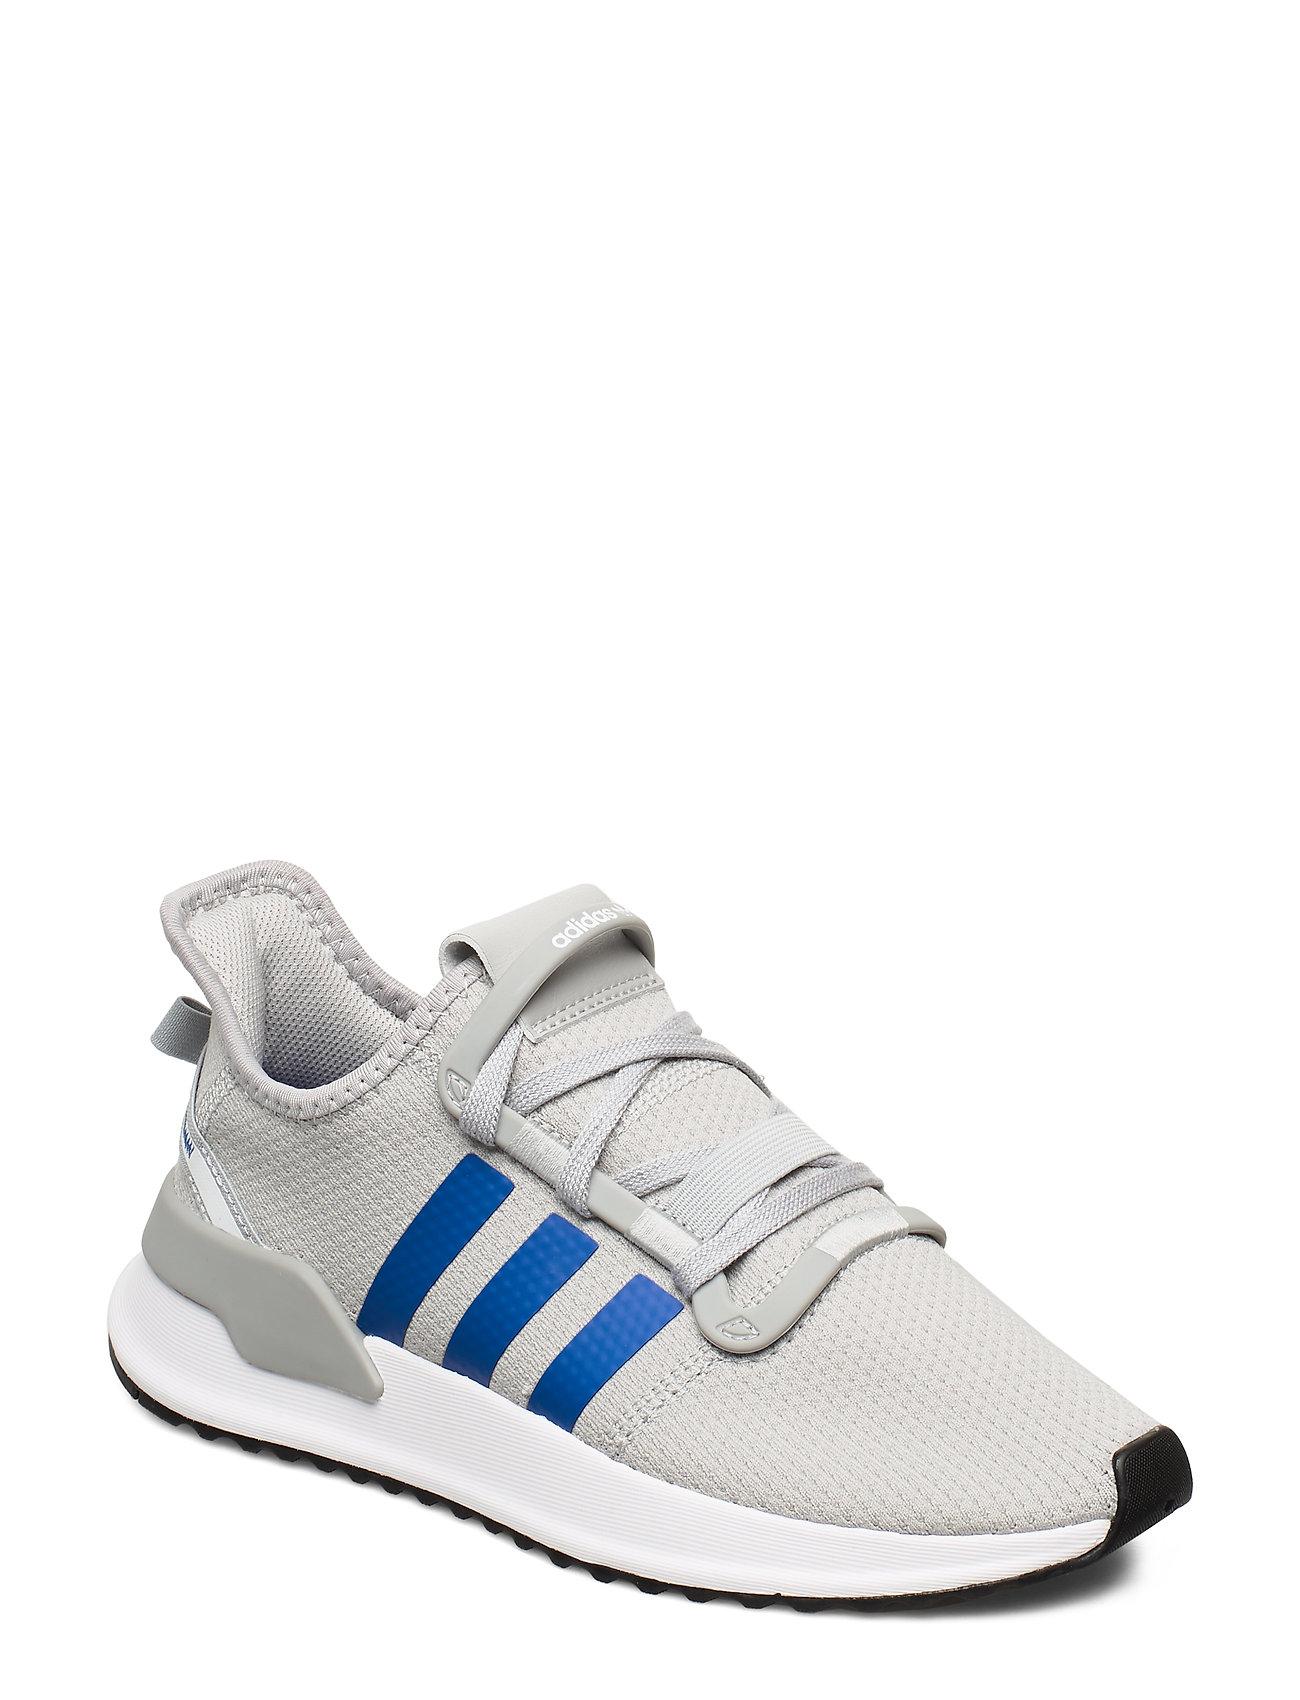 adidas Originals U_PATH RUN J - GRETWO/BLUE/FTWWHT